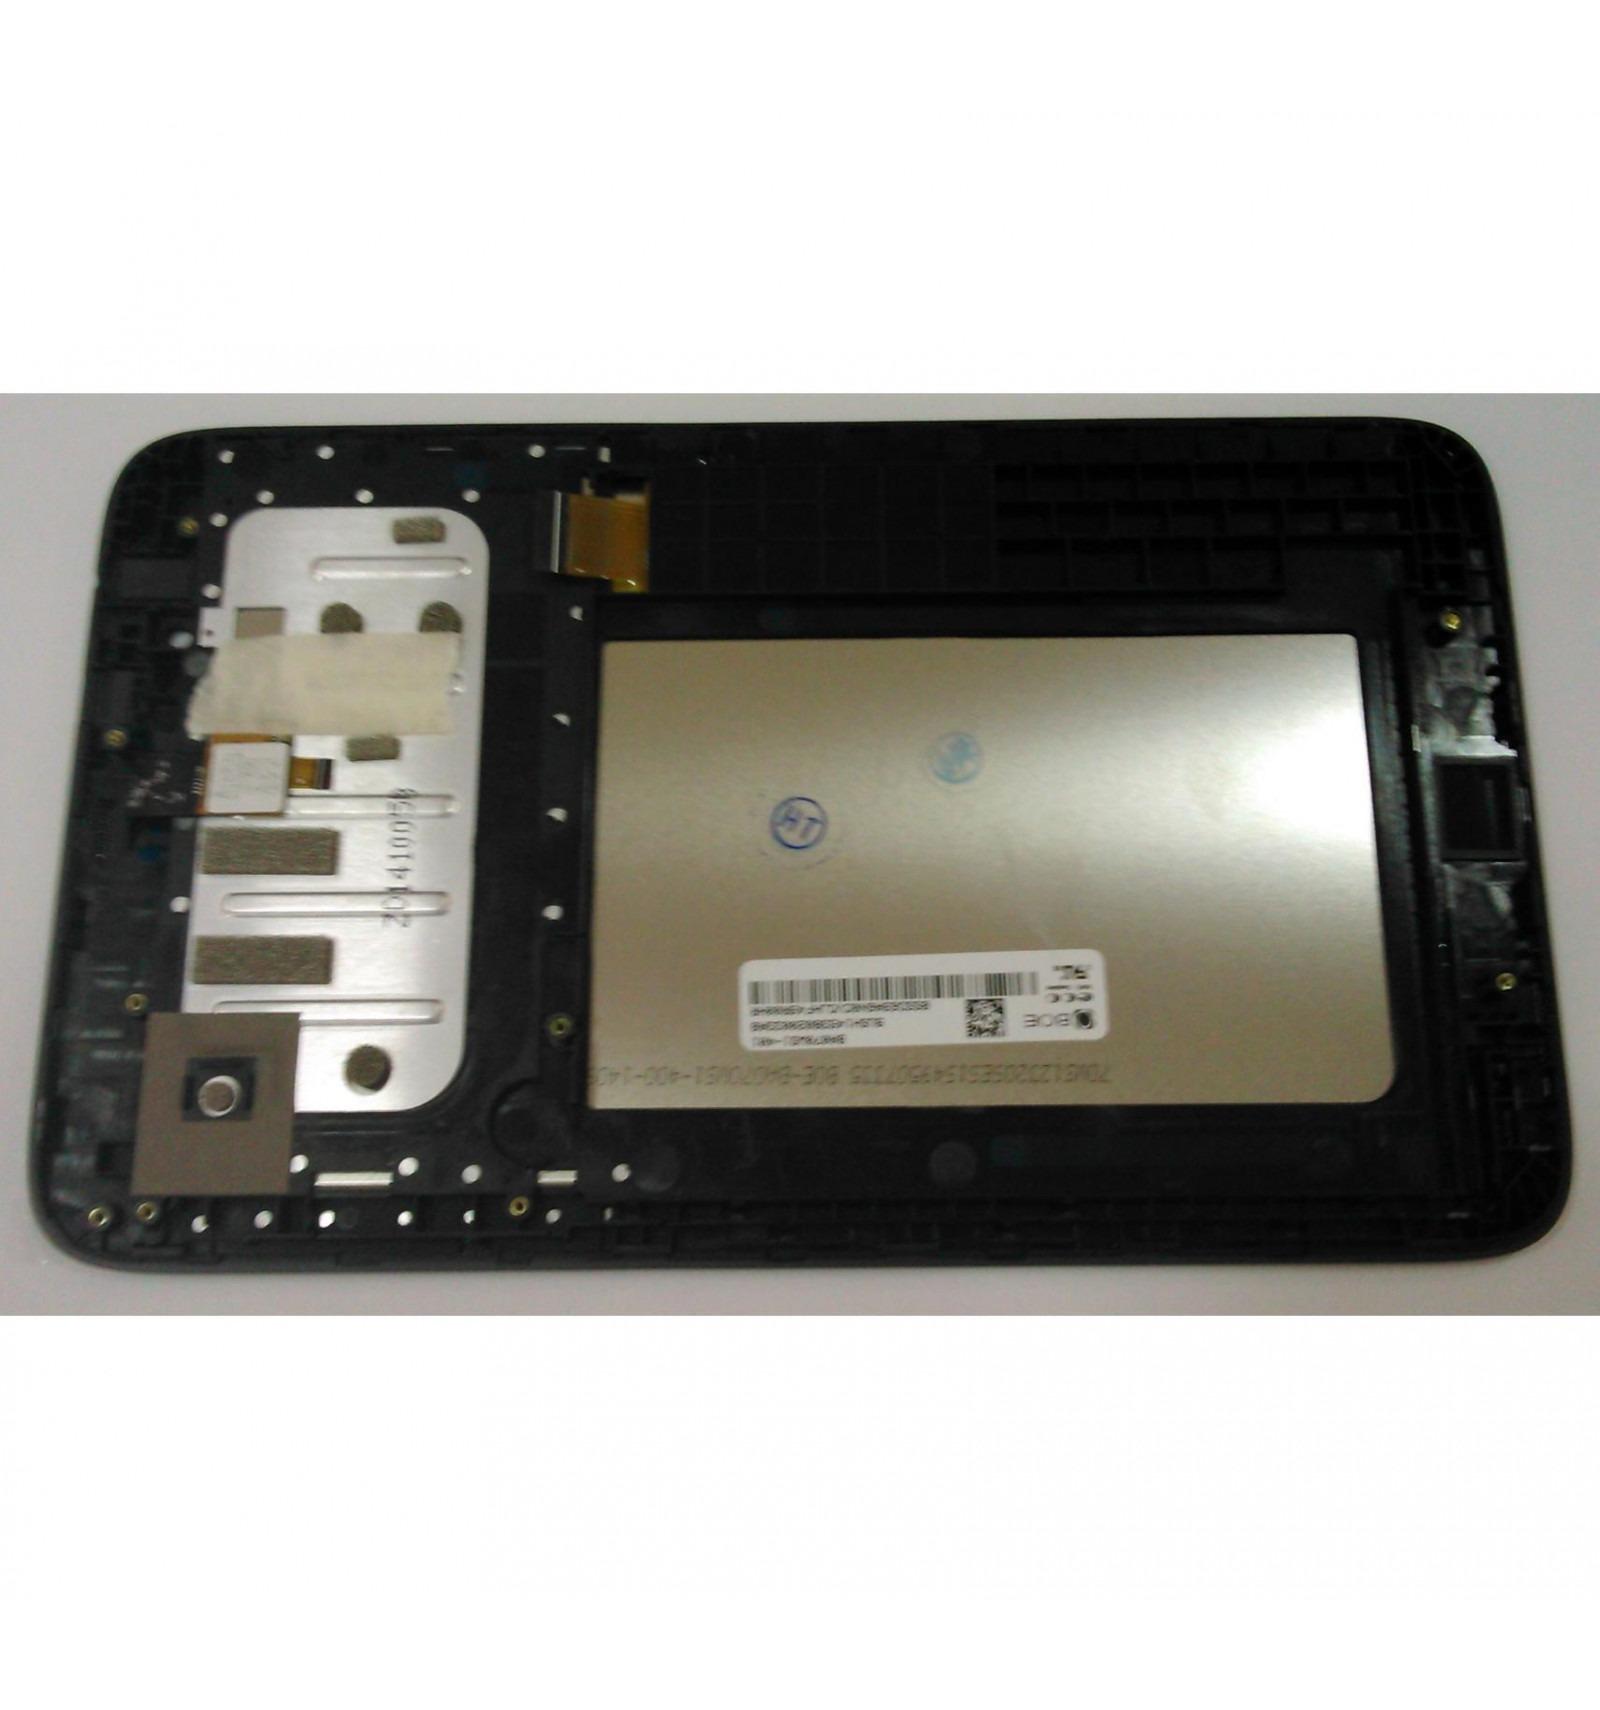 Lenovo Tab A7 30 A3300 Original Display Lcd With Black Touch Screen Tab2 Pantalla Tactil Negro Marco